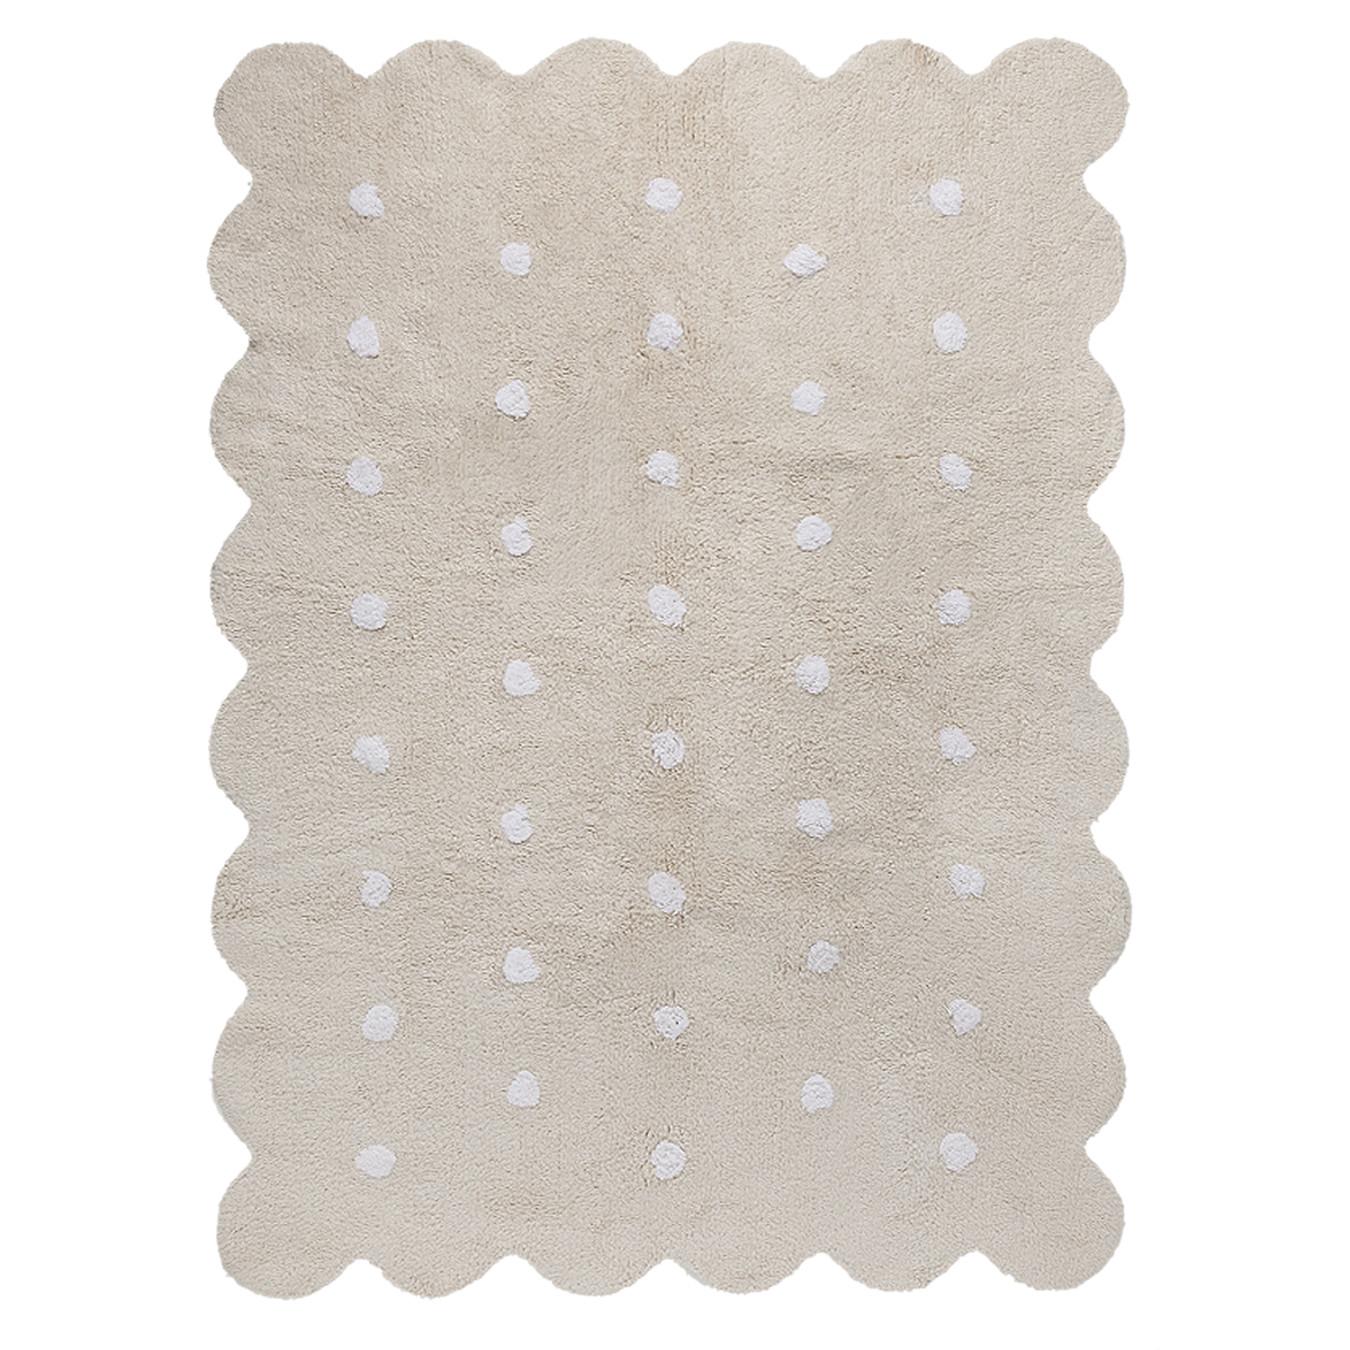 Lorena Canals koberce Pro zvířata: Pratelný koberec Biscuit Beige - 120x160 cm